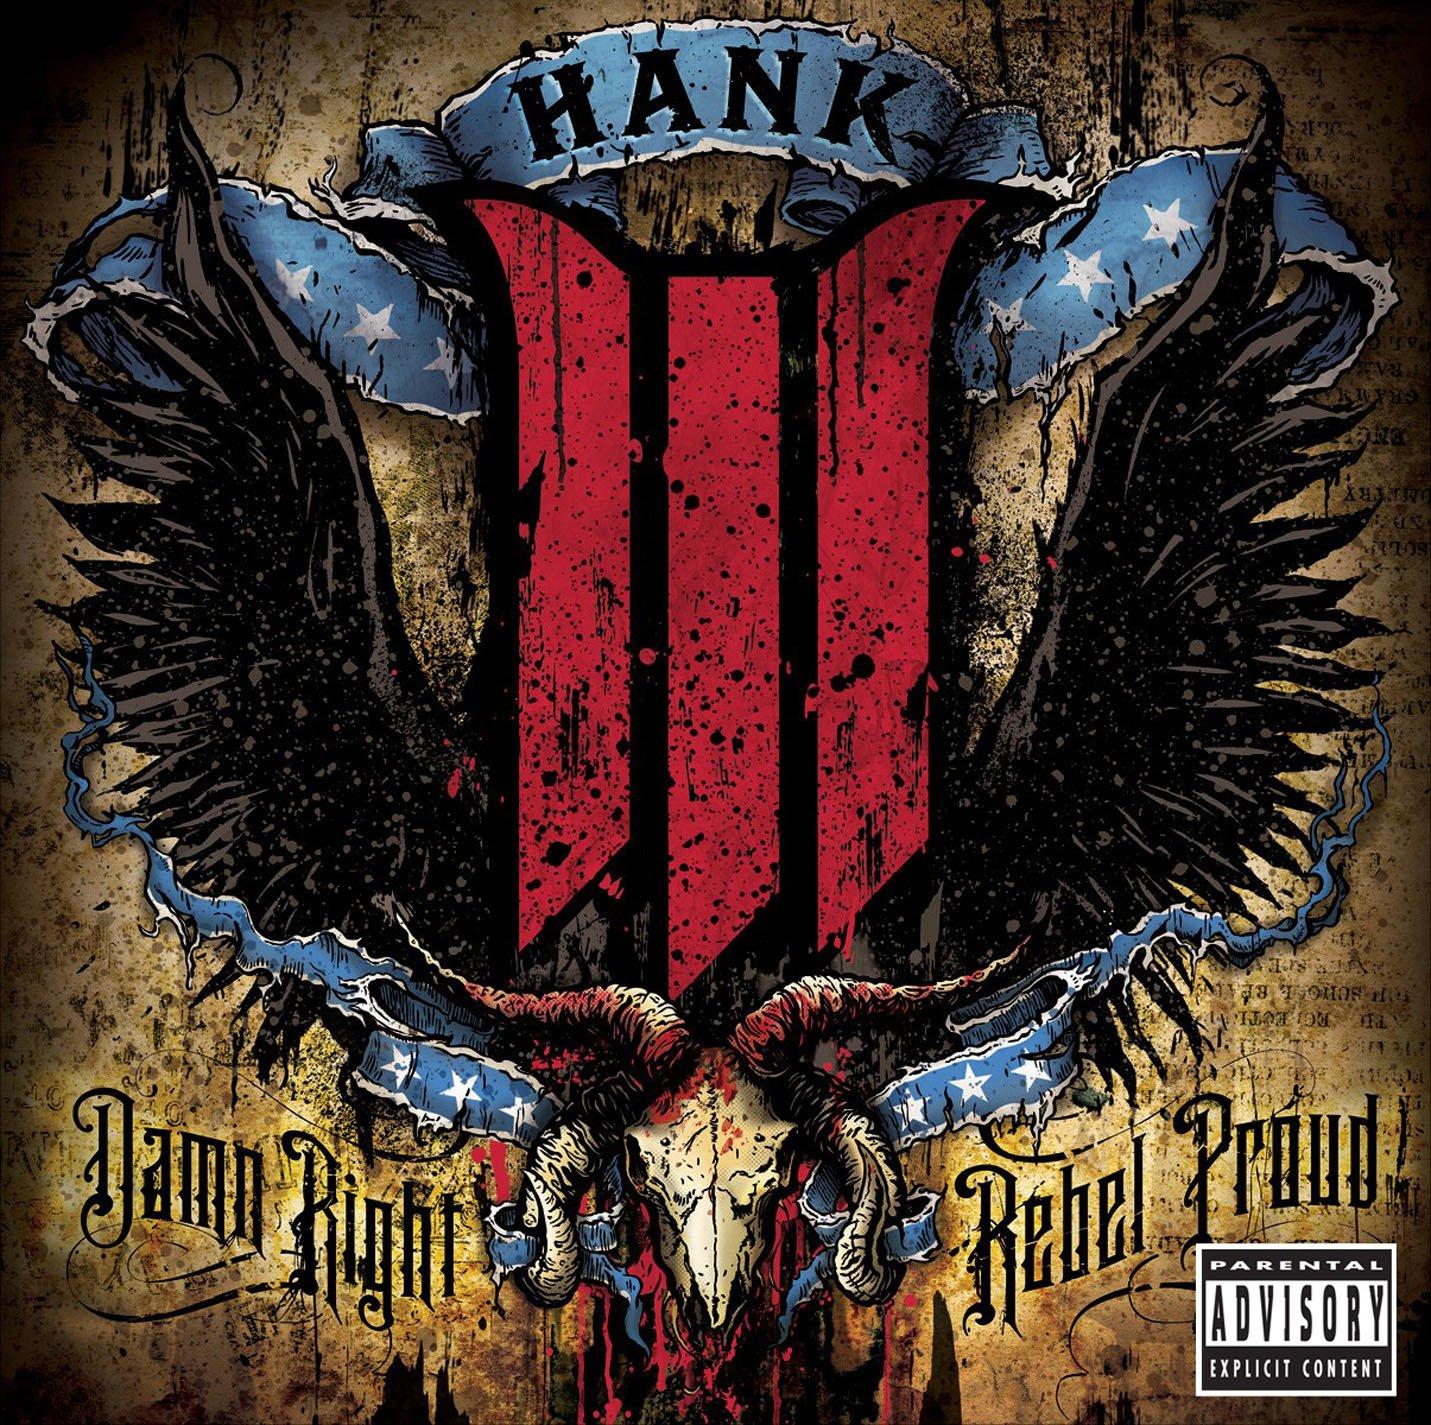 Hank Williams III, Damn Right Rebel Proud